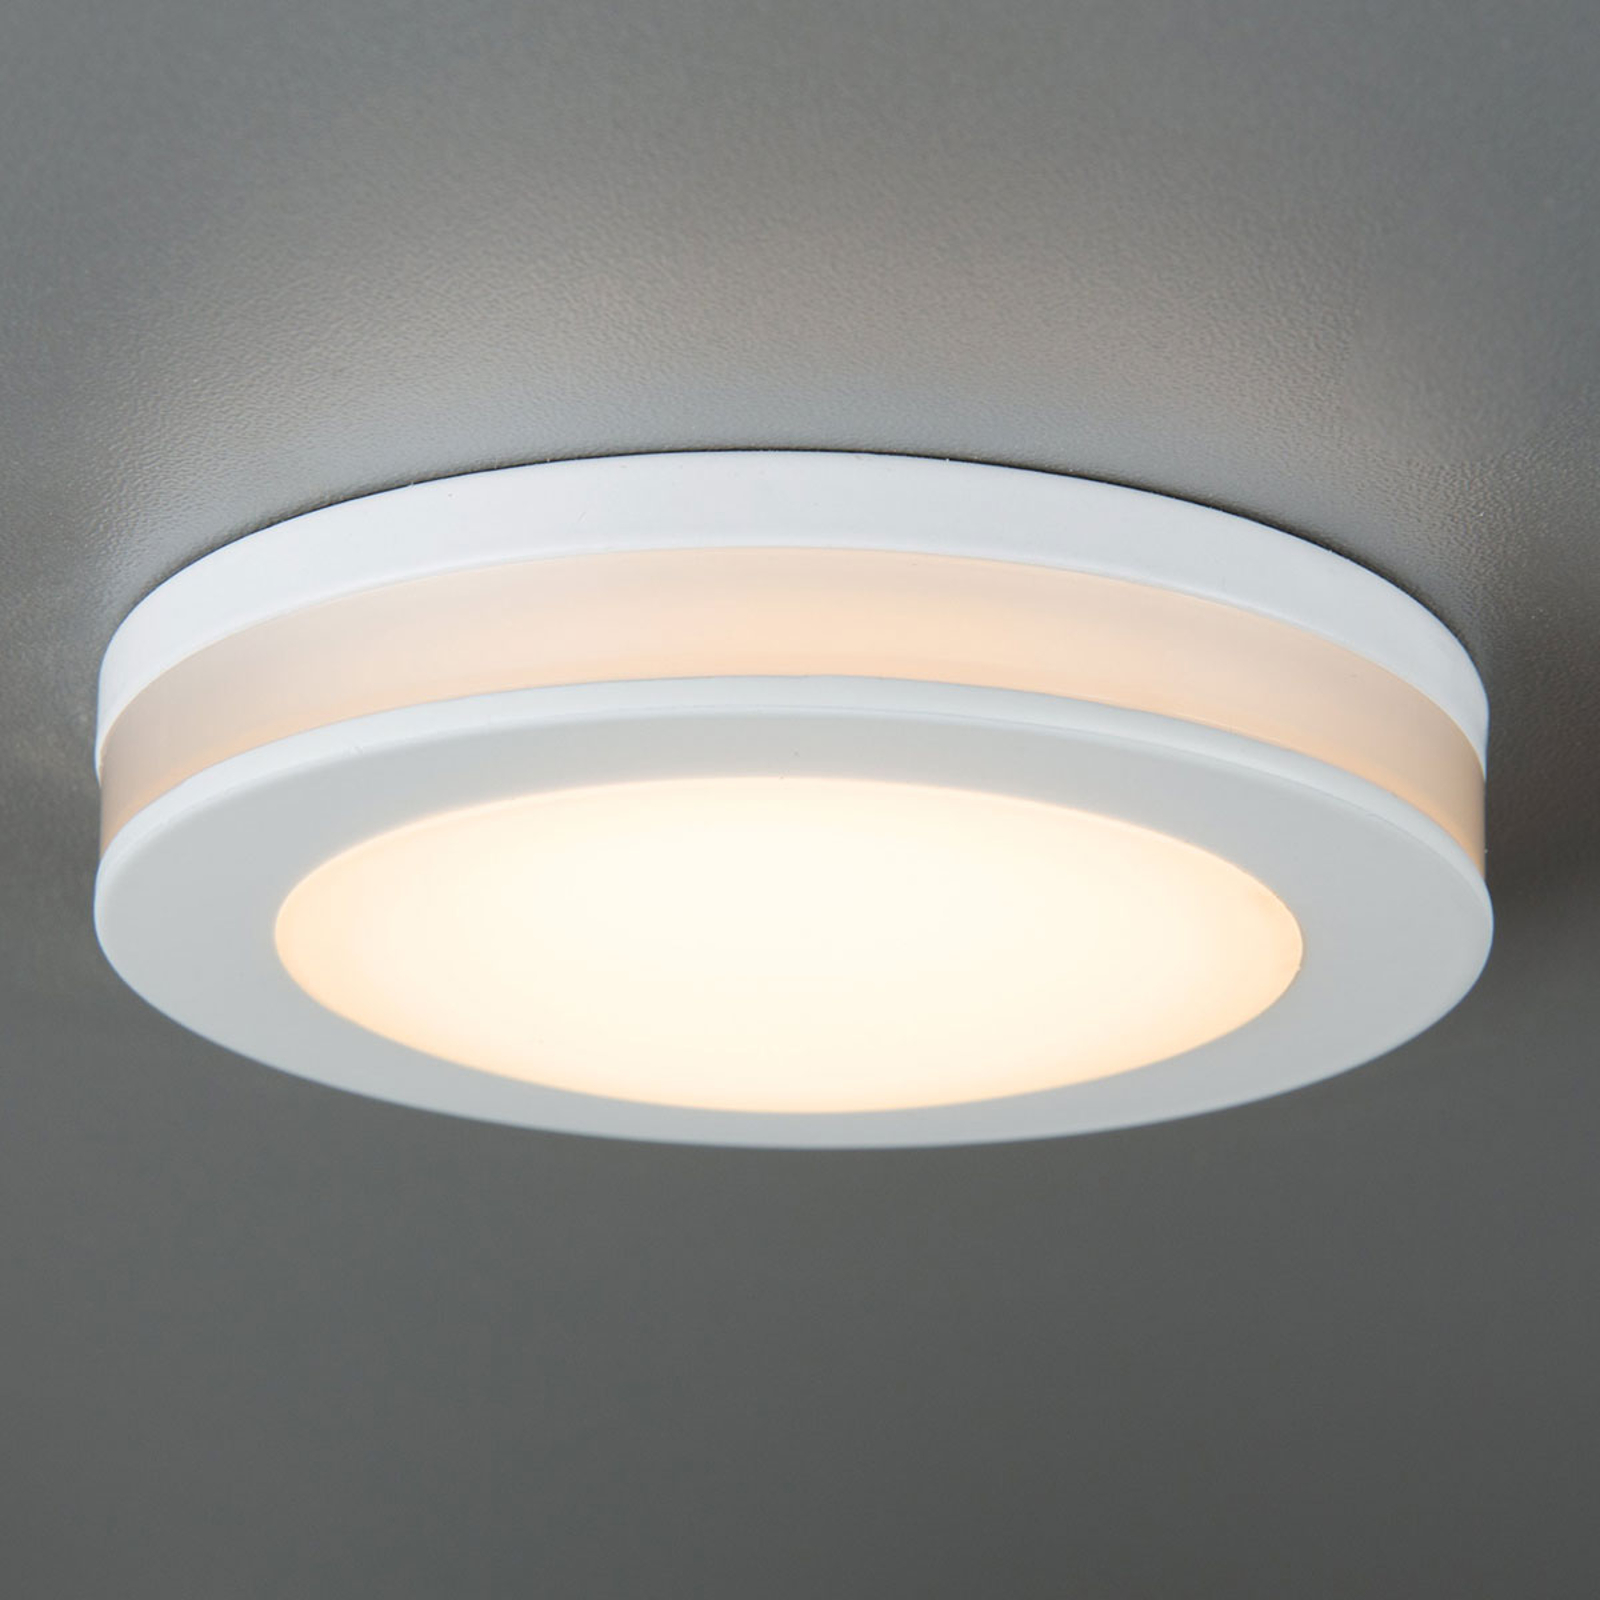 LED-uppokohdevalo Artemis 6 W valkoinen